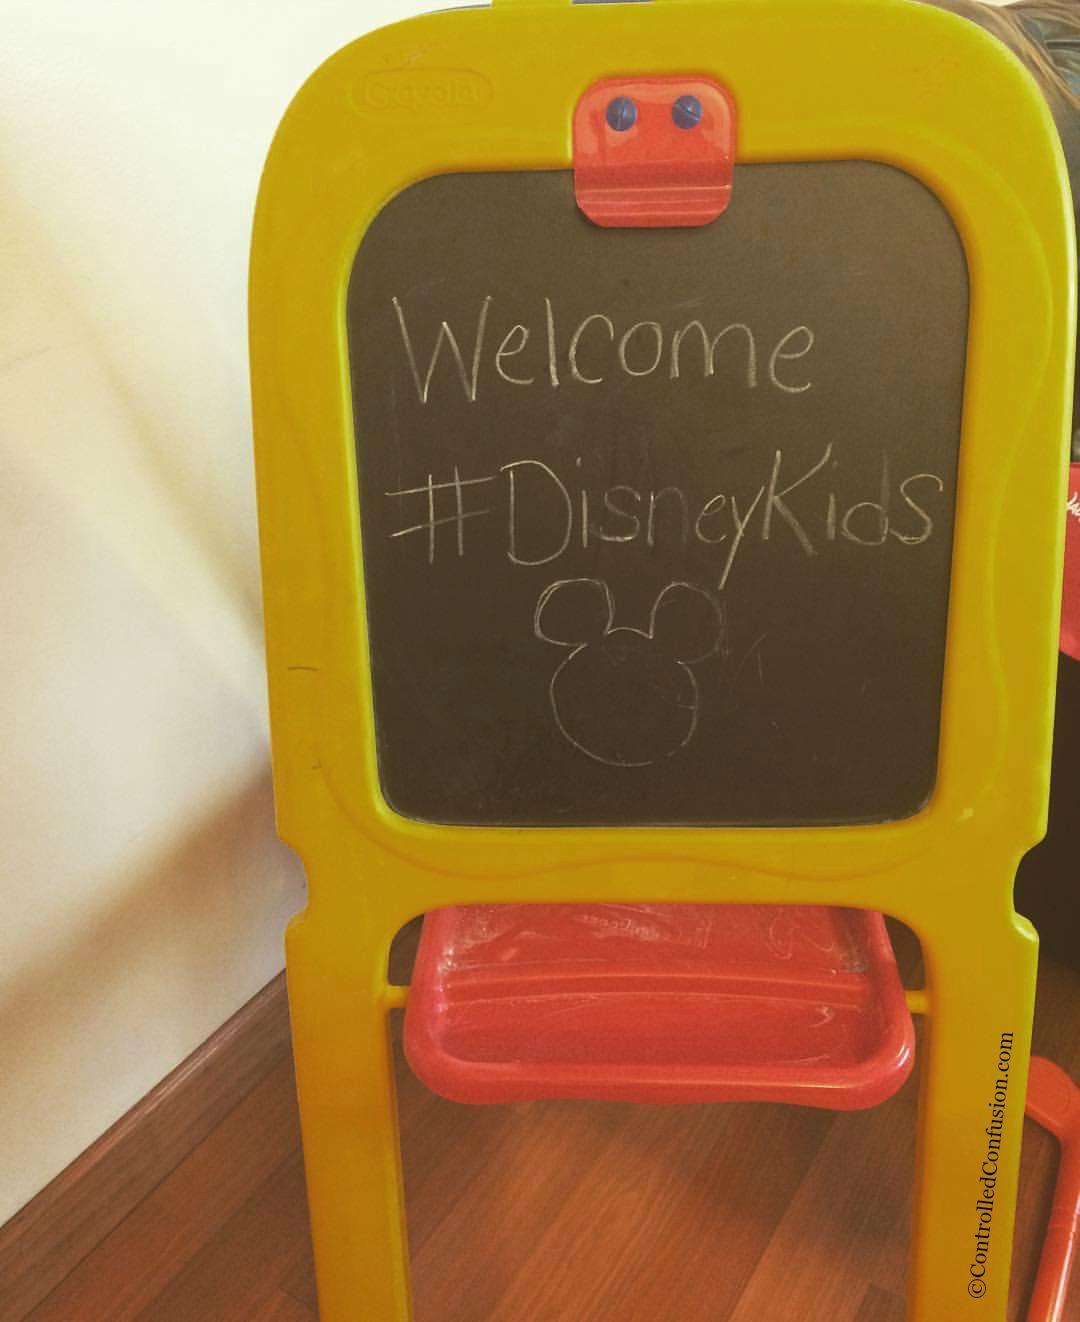 Our #DisneyKids Preschool Playdate Clubhouse Adventure